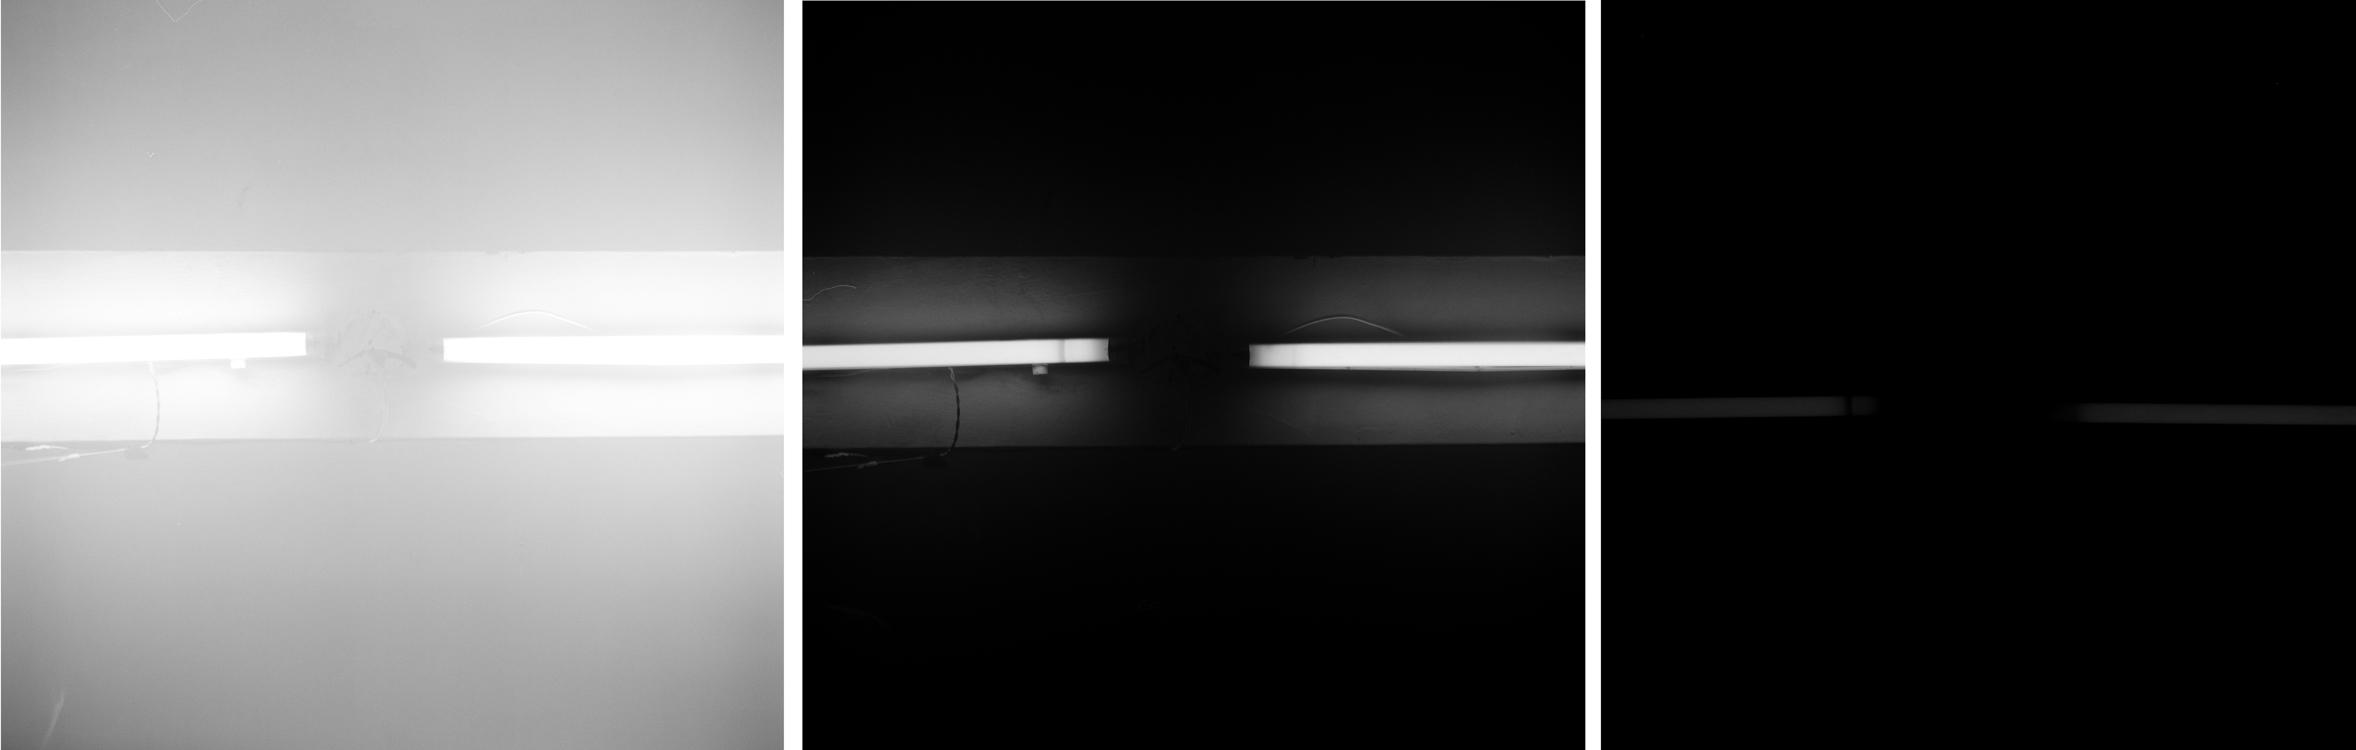 Flourscent Light《灯管 》by Bu Yun Jun 卜云军,100×100cm x 3, 2010